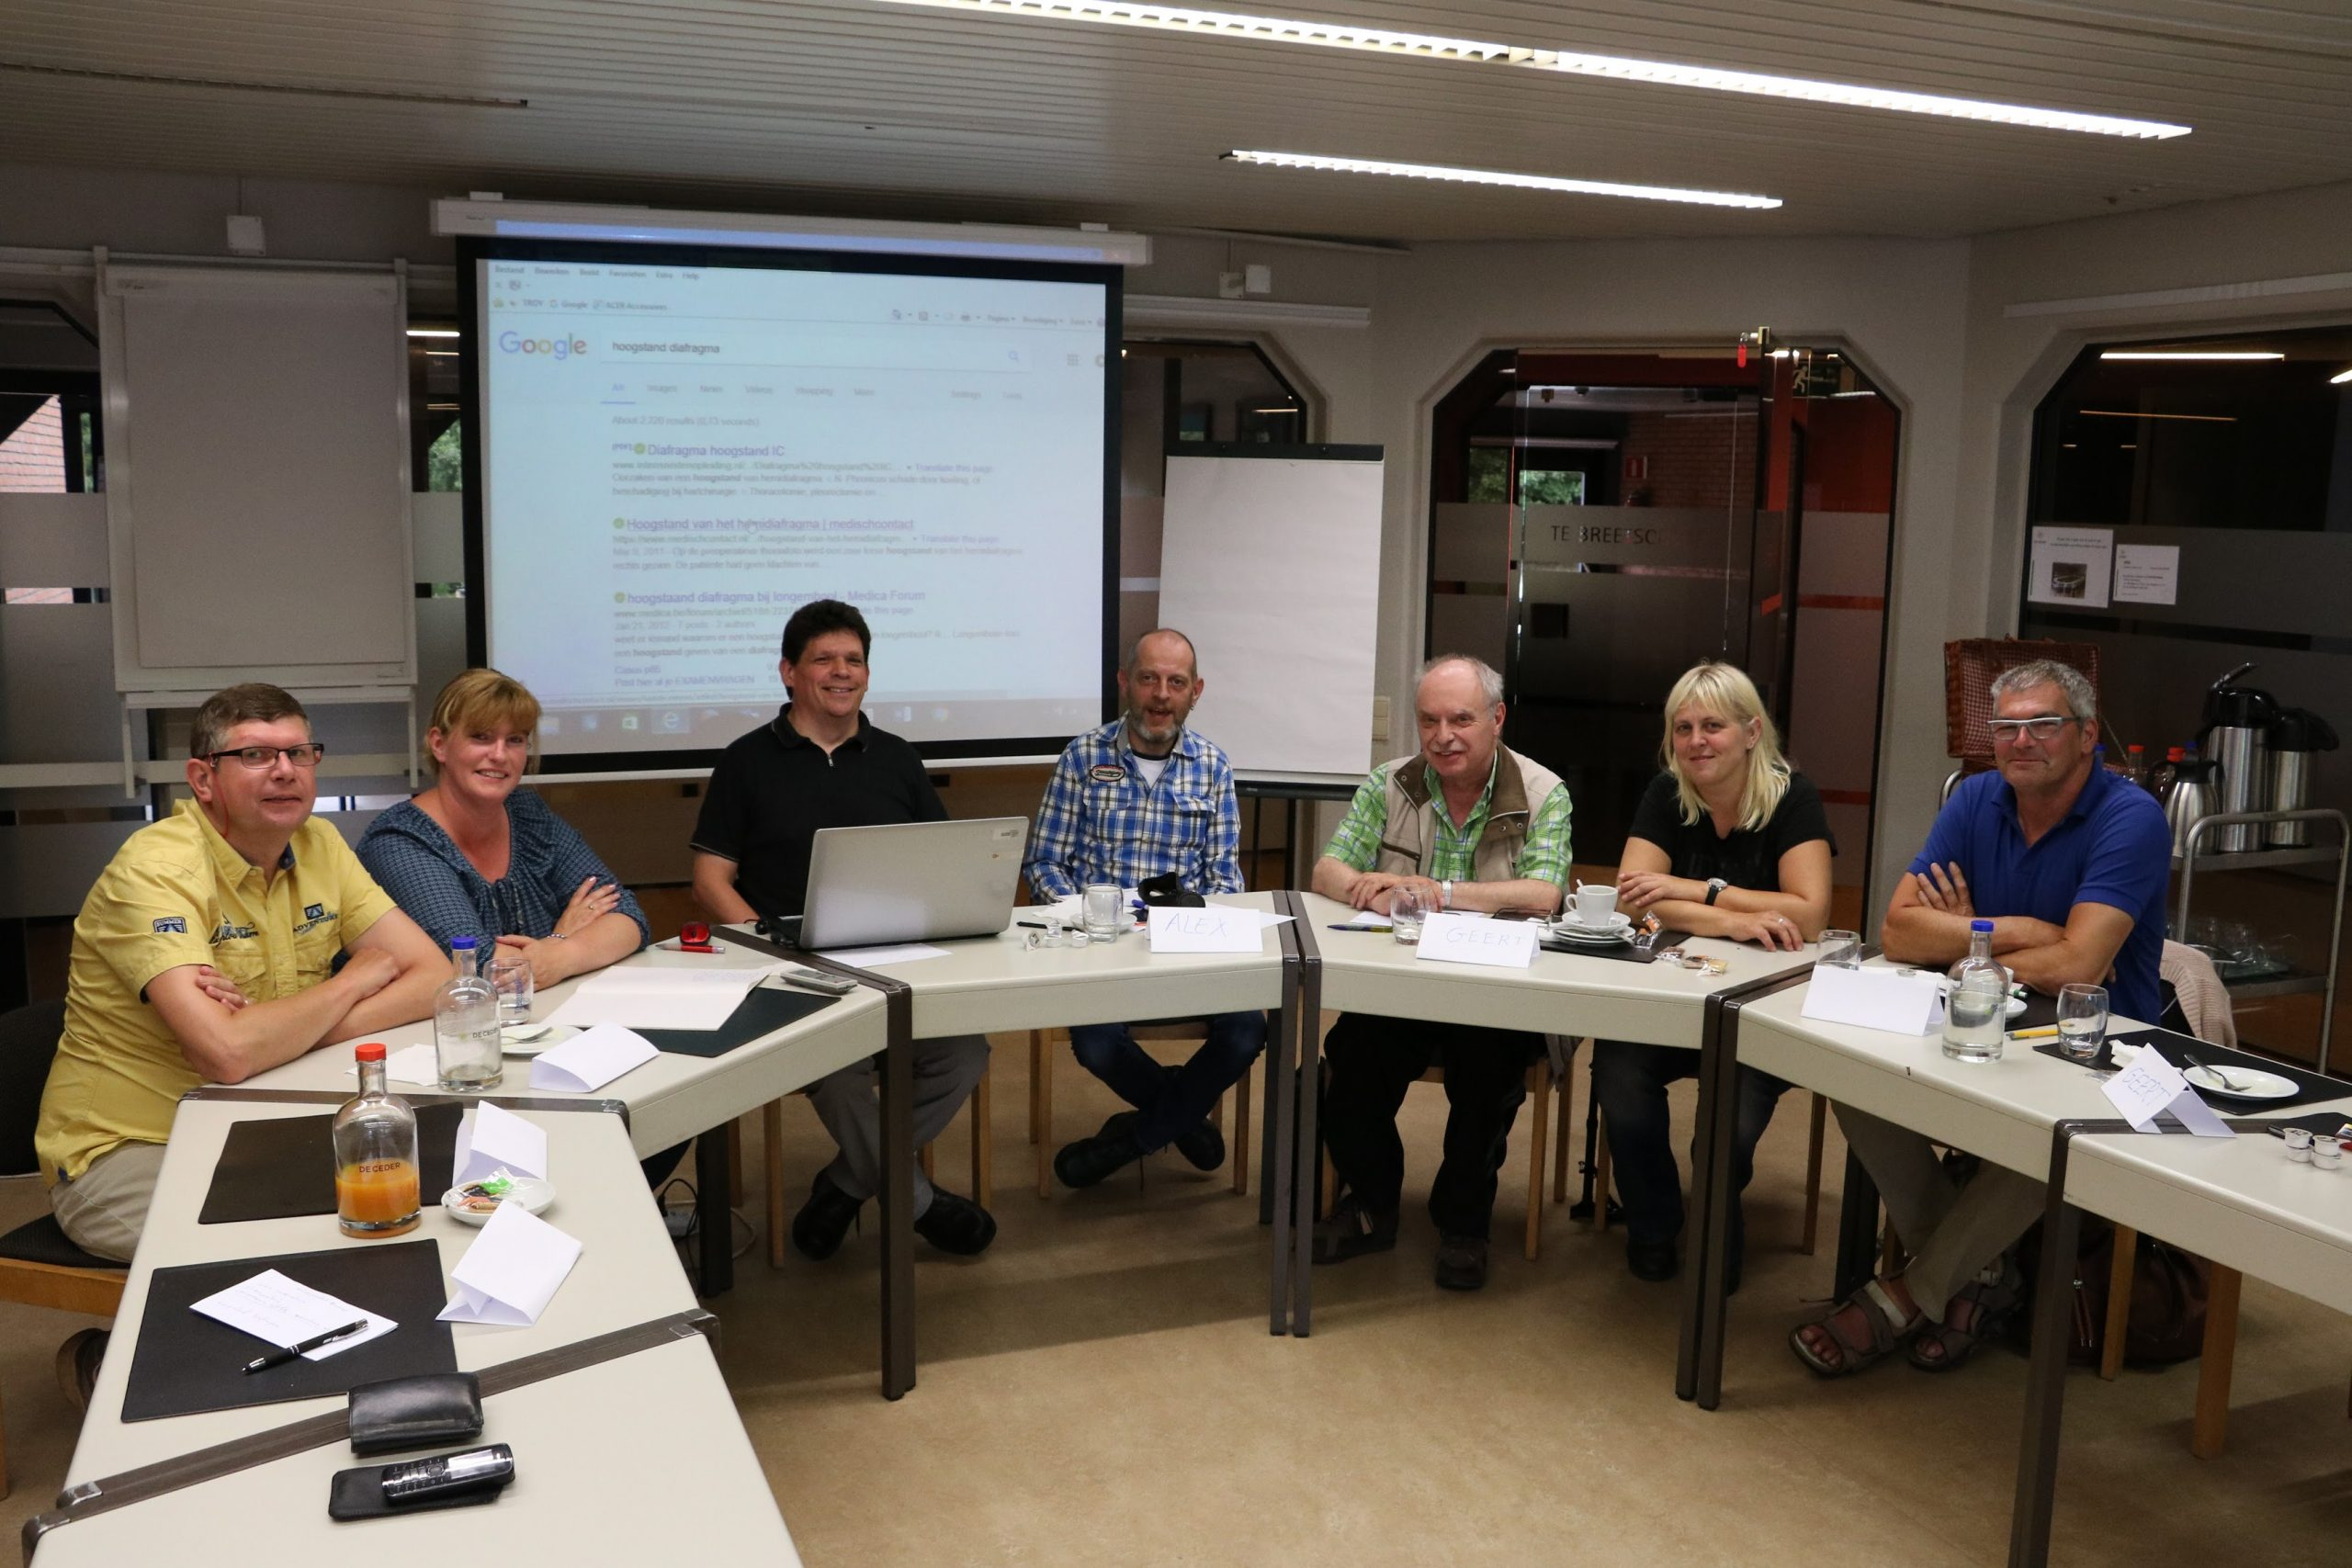 Online-activiteit-Spierziekten-Vlaanderen-vzw-scaled Welkom bij Spierziekten Vlaanderen vzw